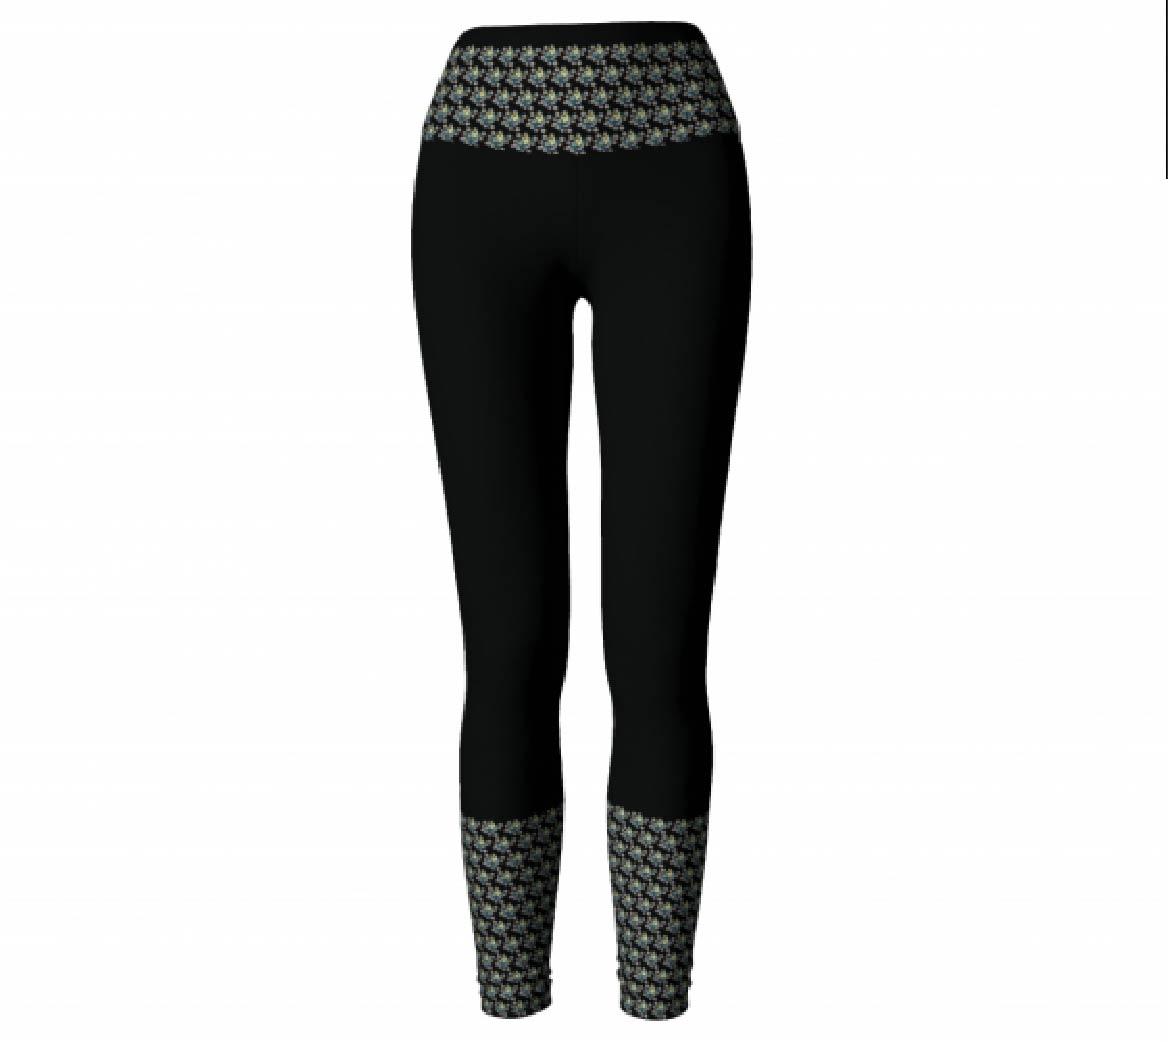 Black Leggings #1          $45